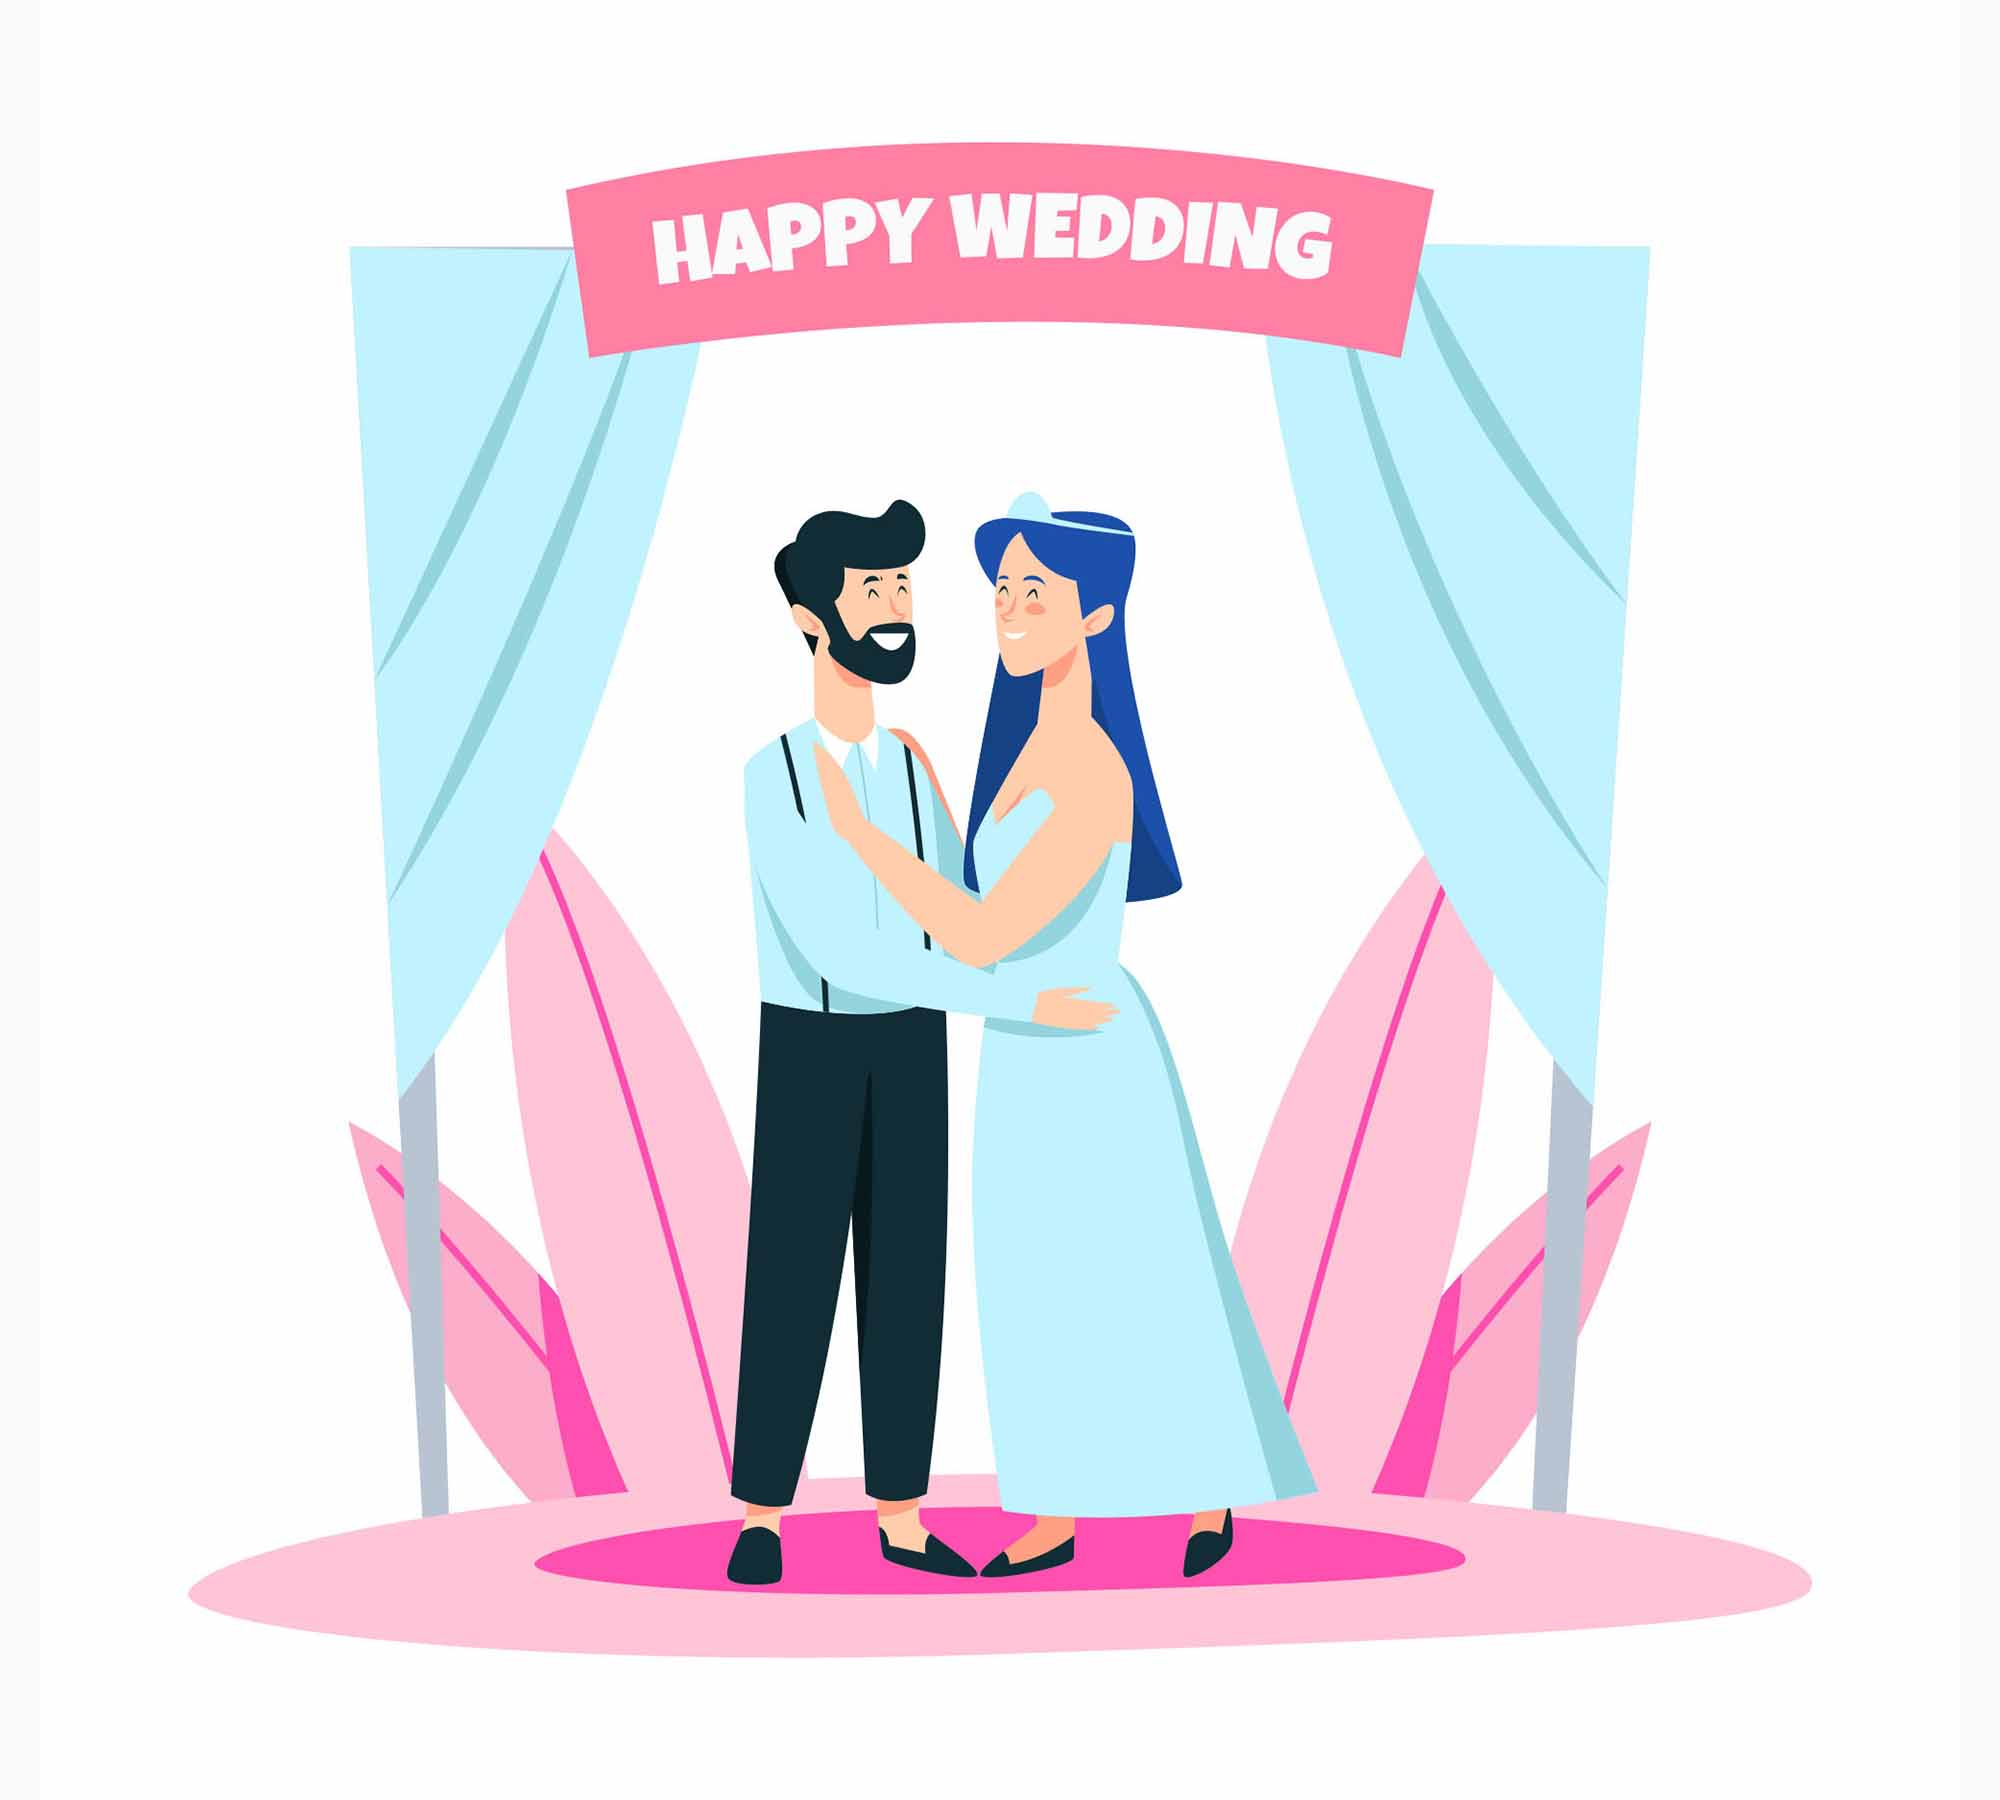 Happy Wedding Illustration